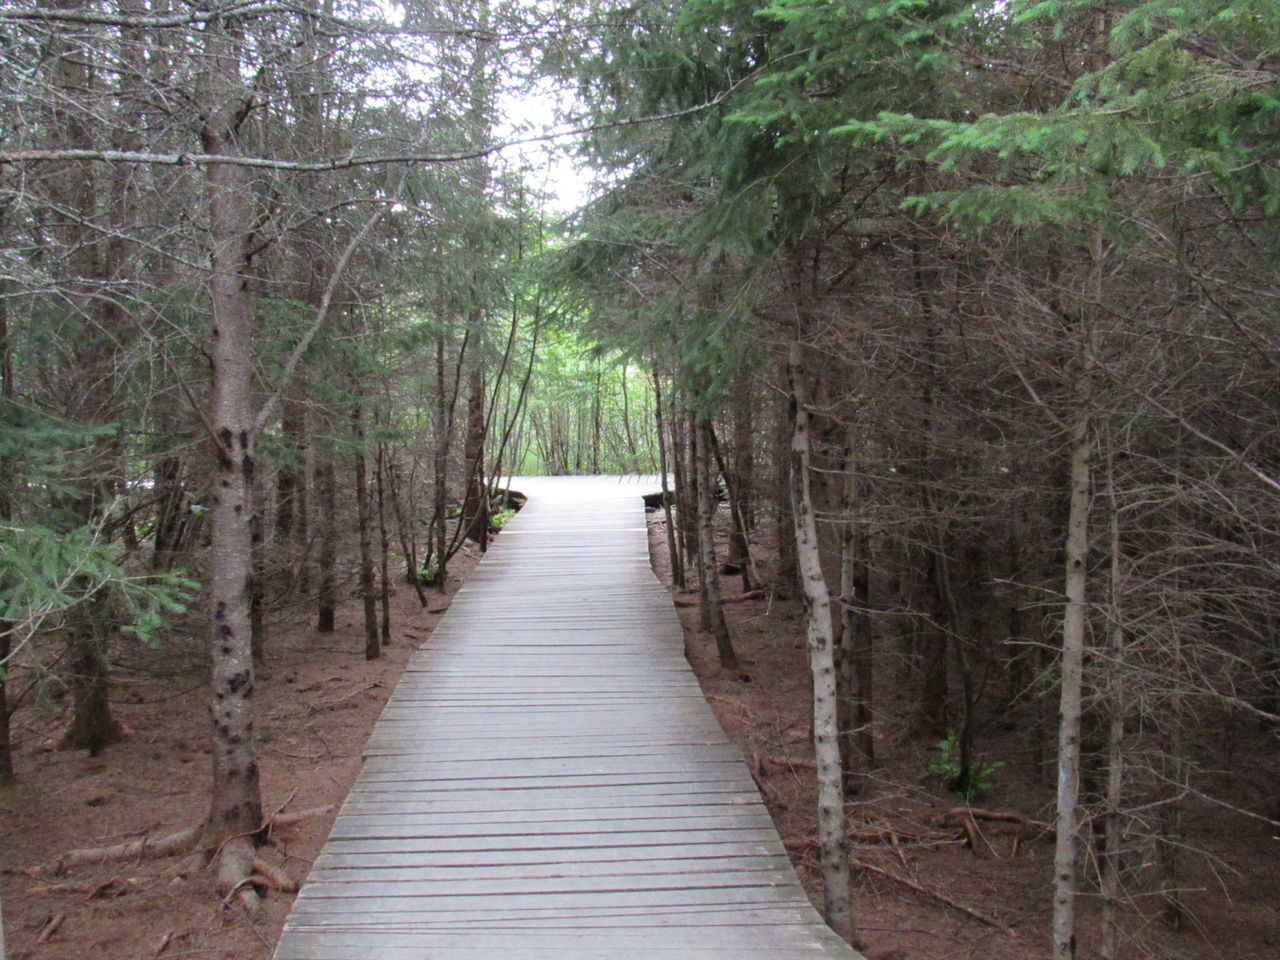 Quebec Sentier Foret Arbre Refuge Nature